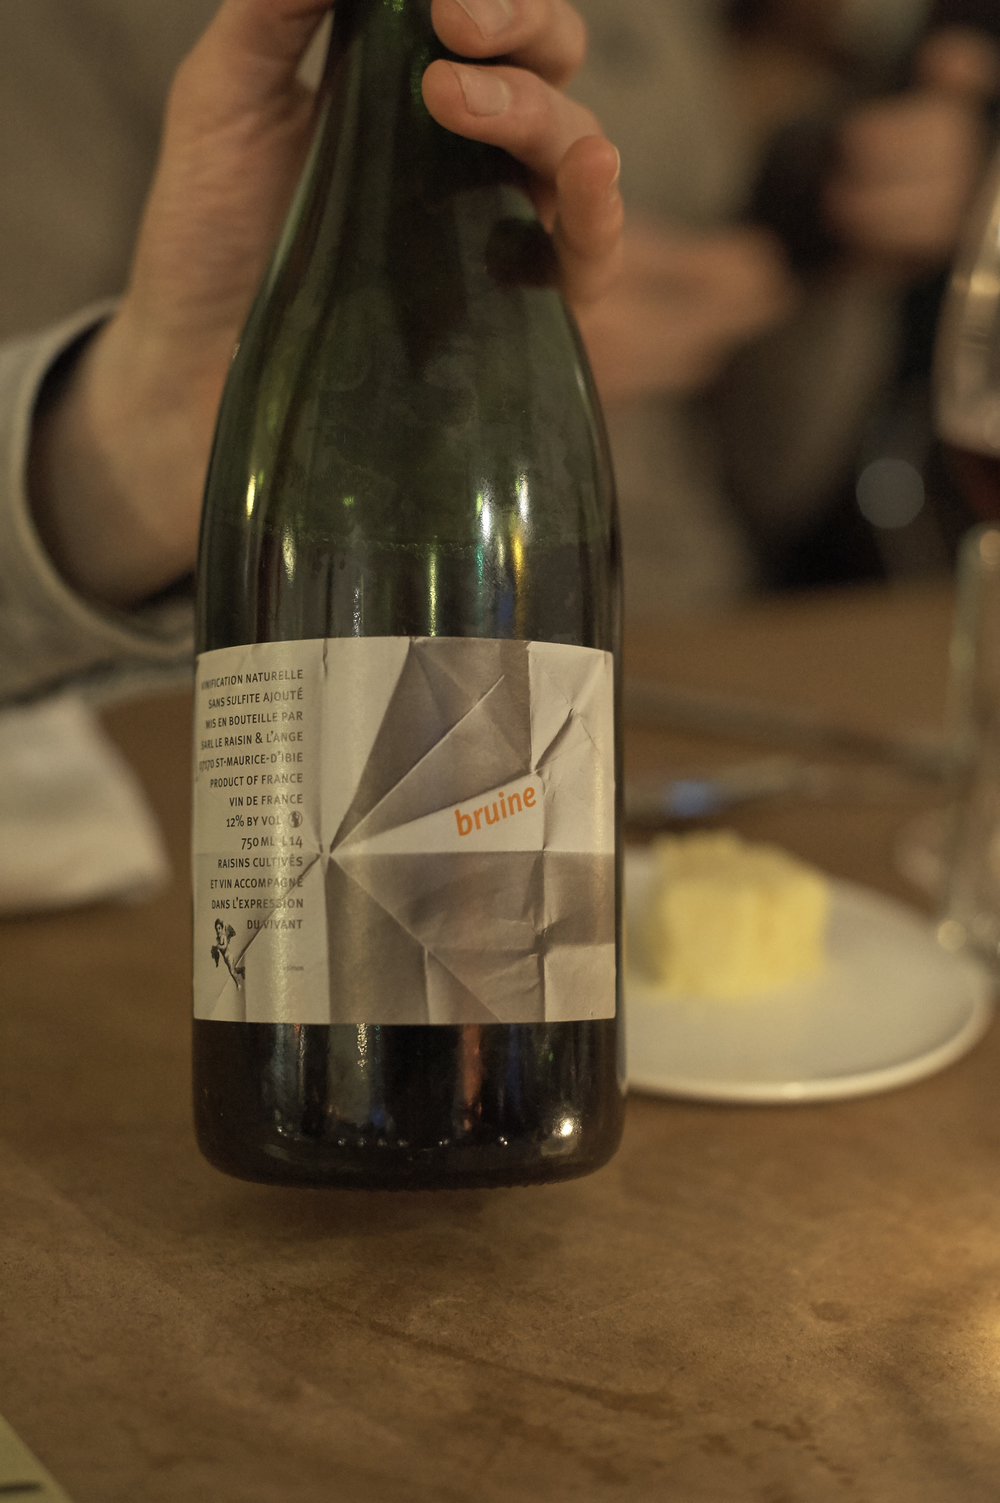 BRUINE, LE RAISIN ET L'ANGE 2014 RHÔNE H & V: «Rosé-Bubbles zum Vorglühen und Absacken»